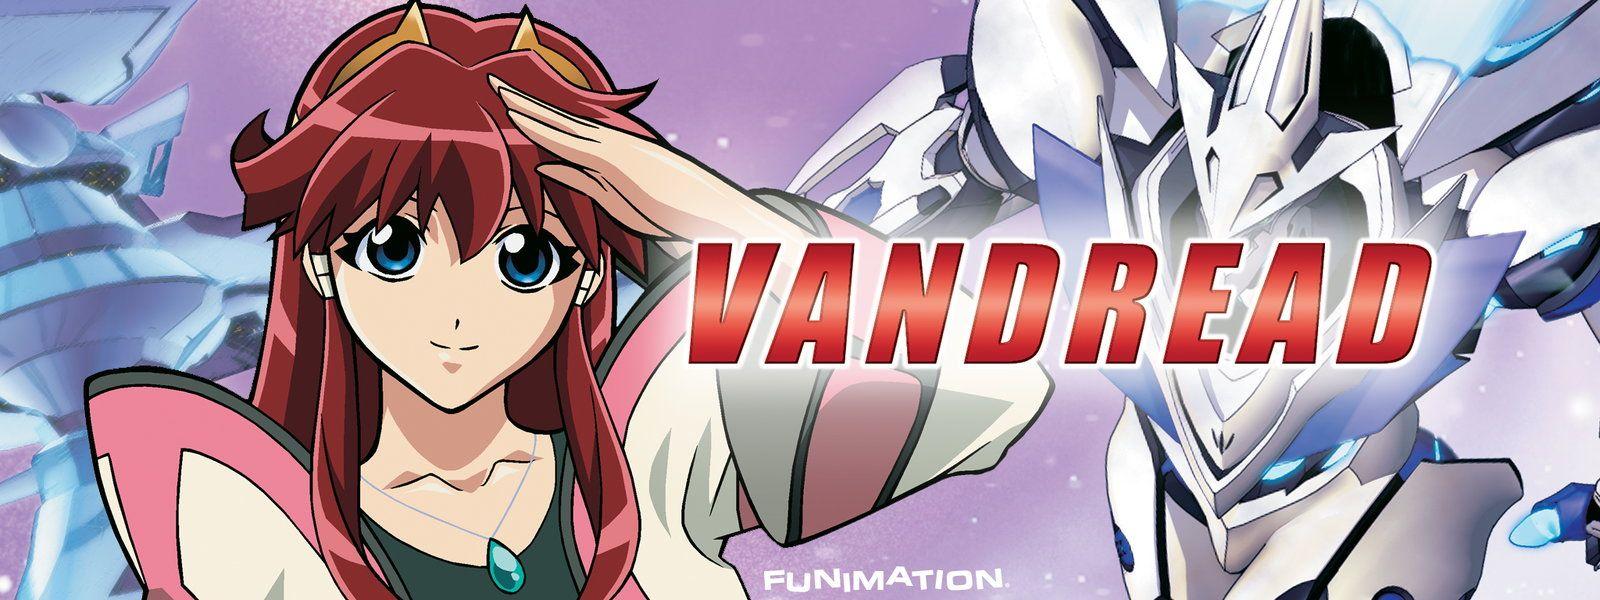 Vandread Anime, Hulu, Streaming